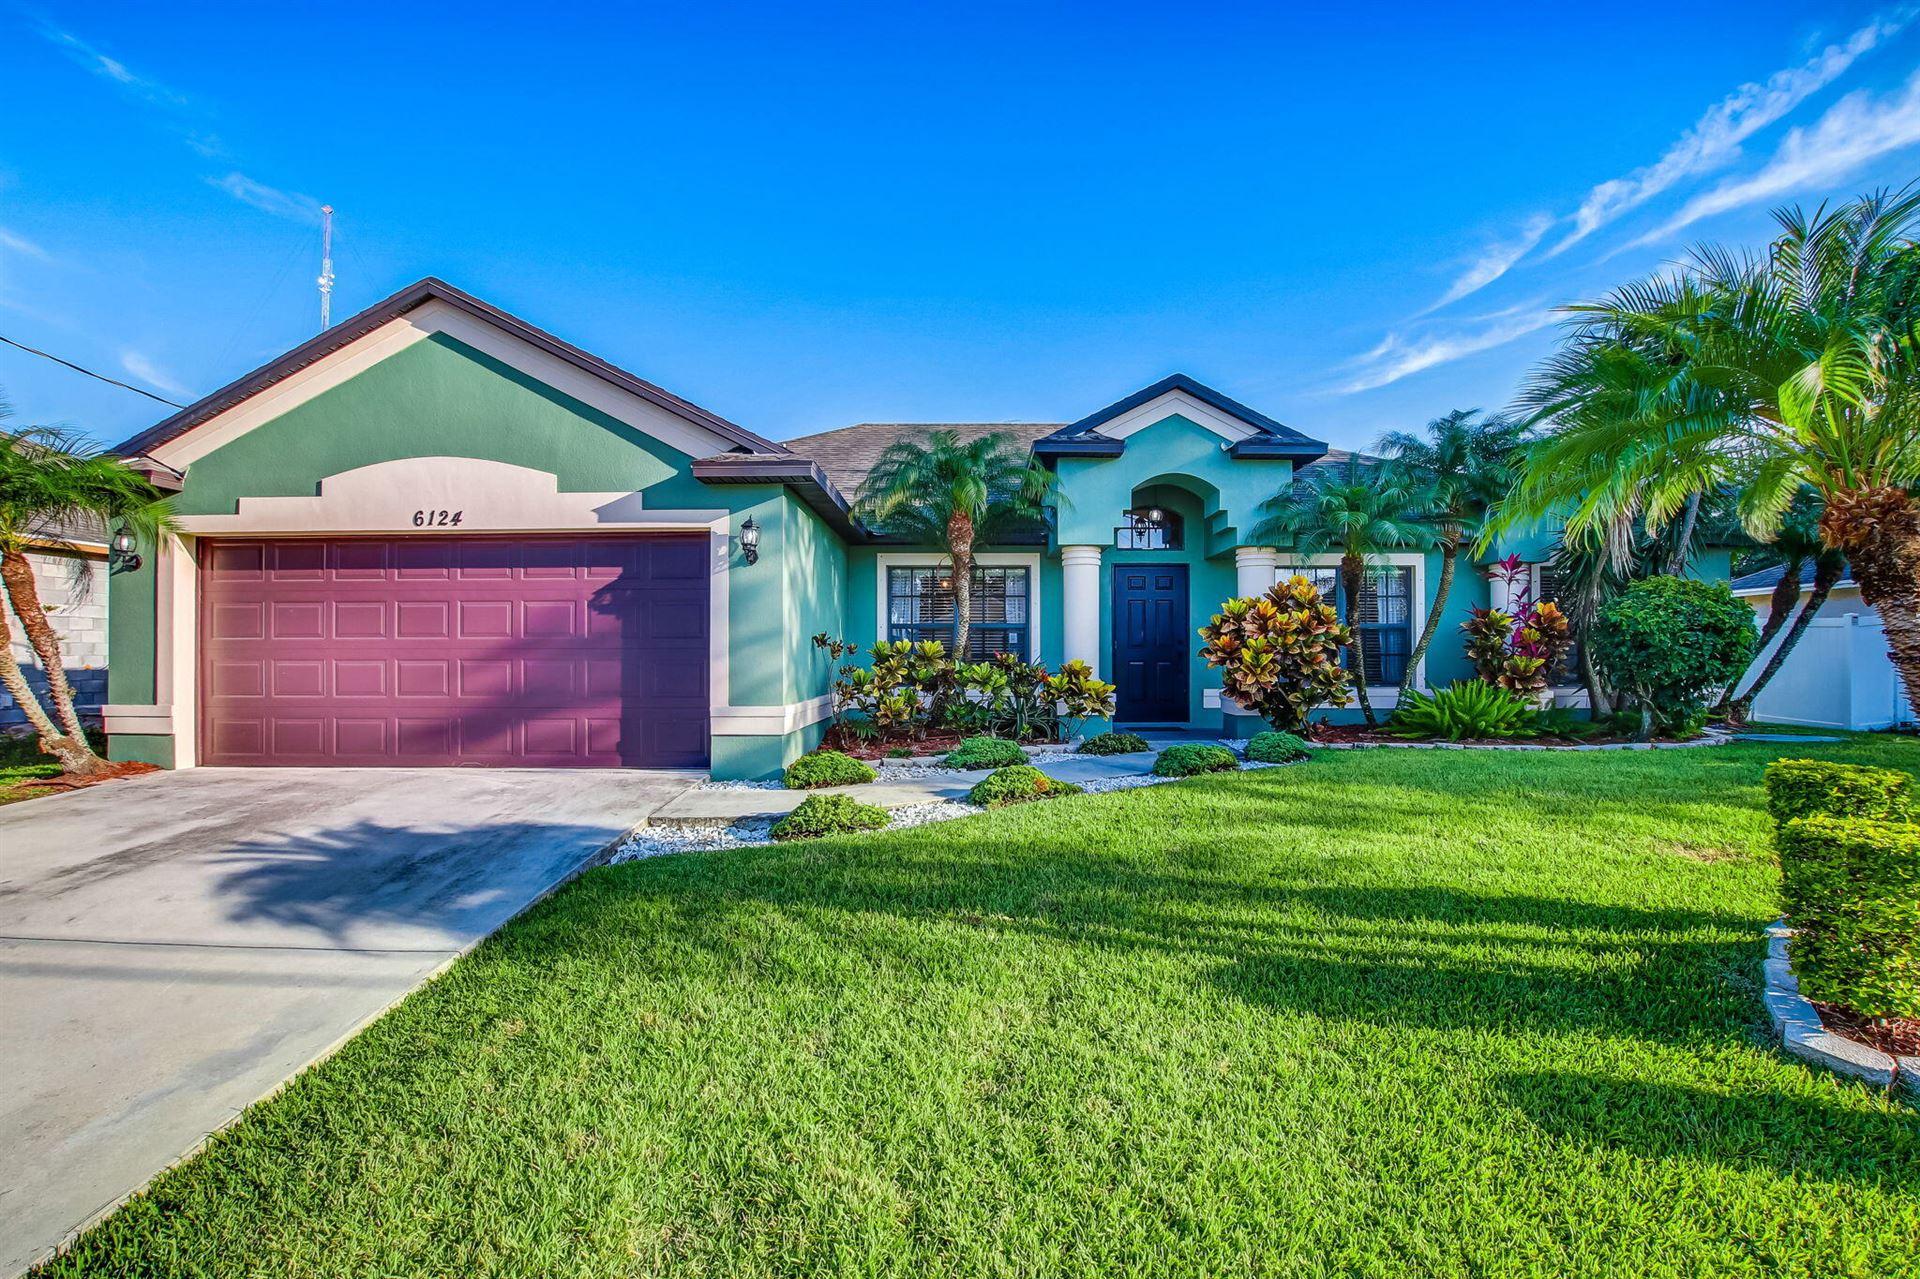 6124 NW Ginger Lane, Port Saint Lucie, FL 34986 - MLS#: RX-10722301